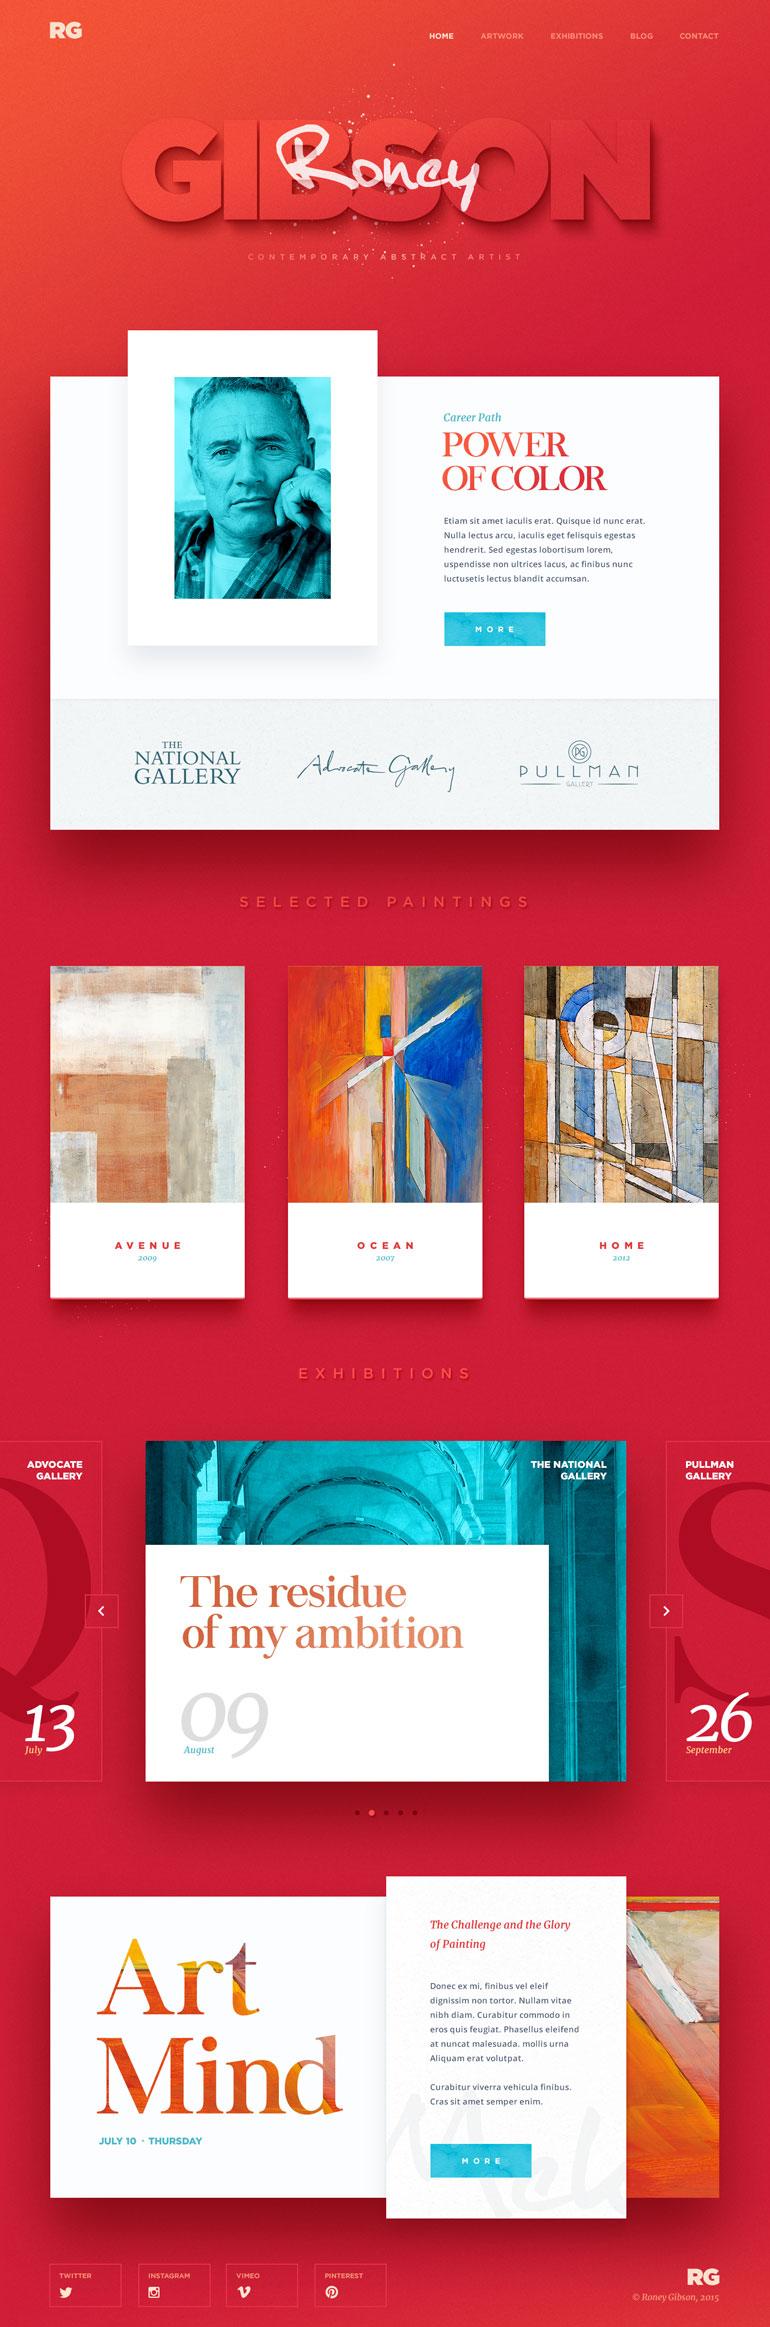 Creative_Website_Design_Inspiration_2016_005